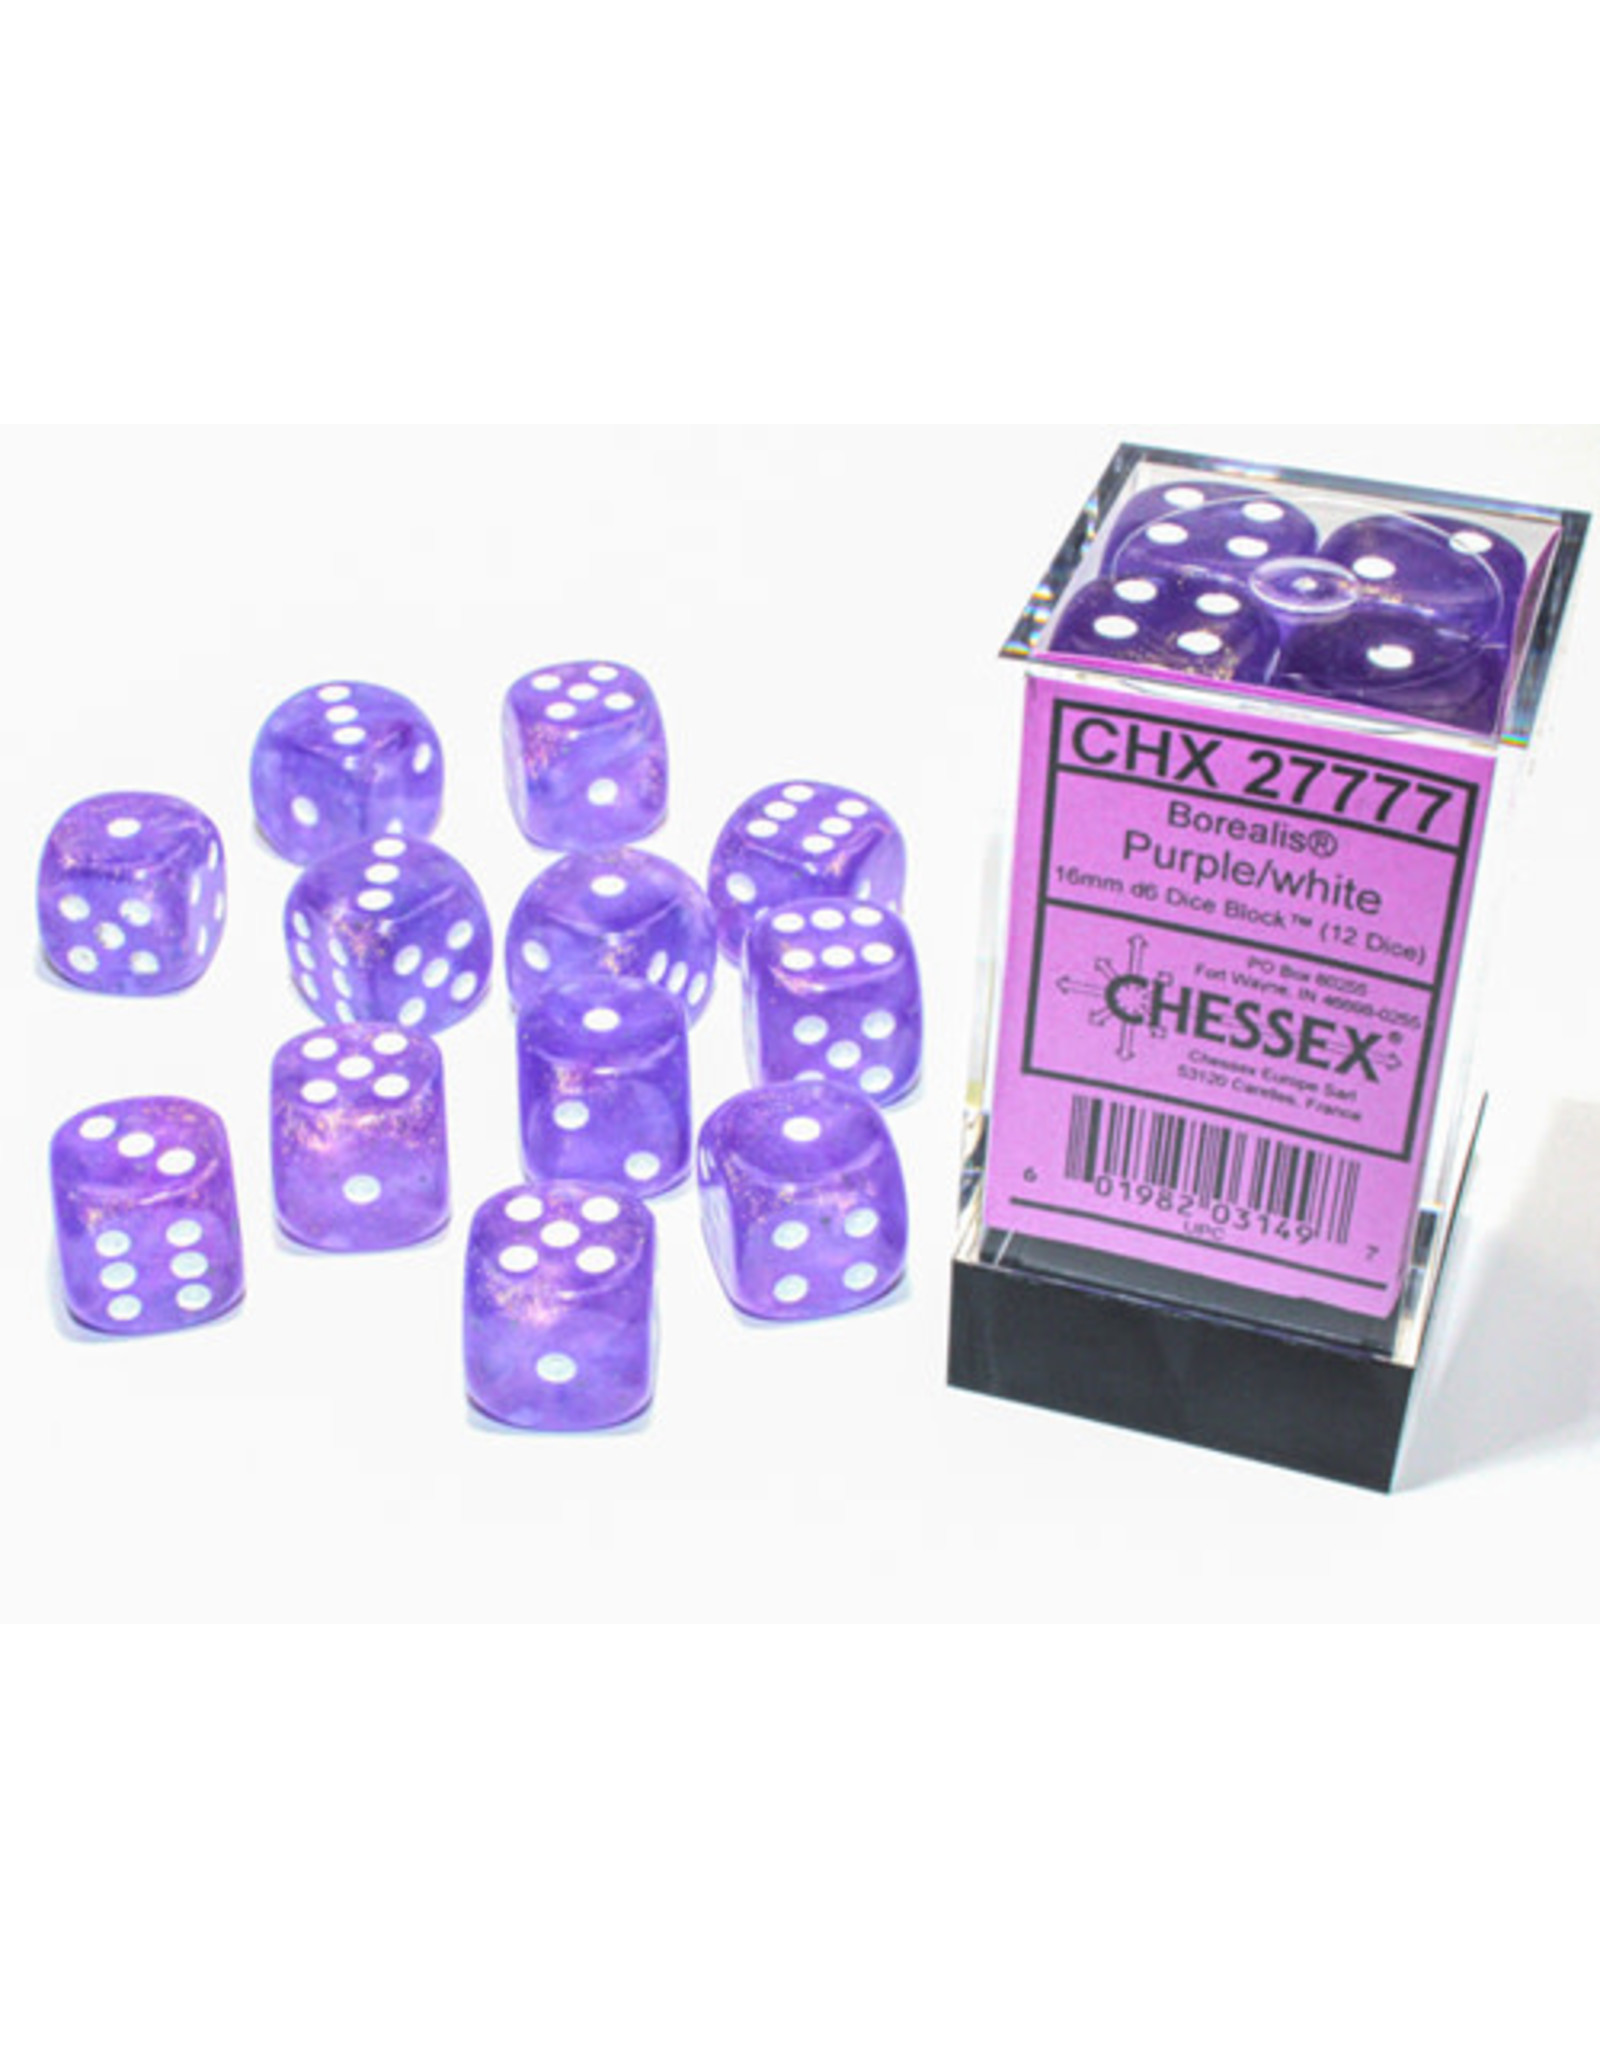 Chessex Borealis 16mm d6 Purple/white Luminary Dice (12)